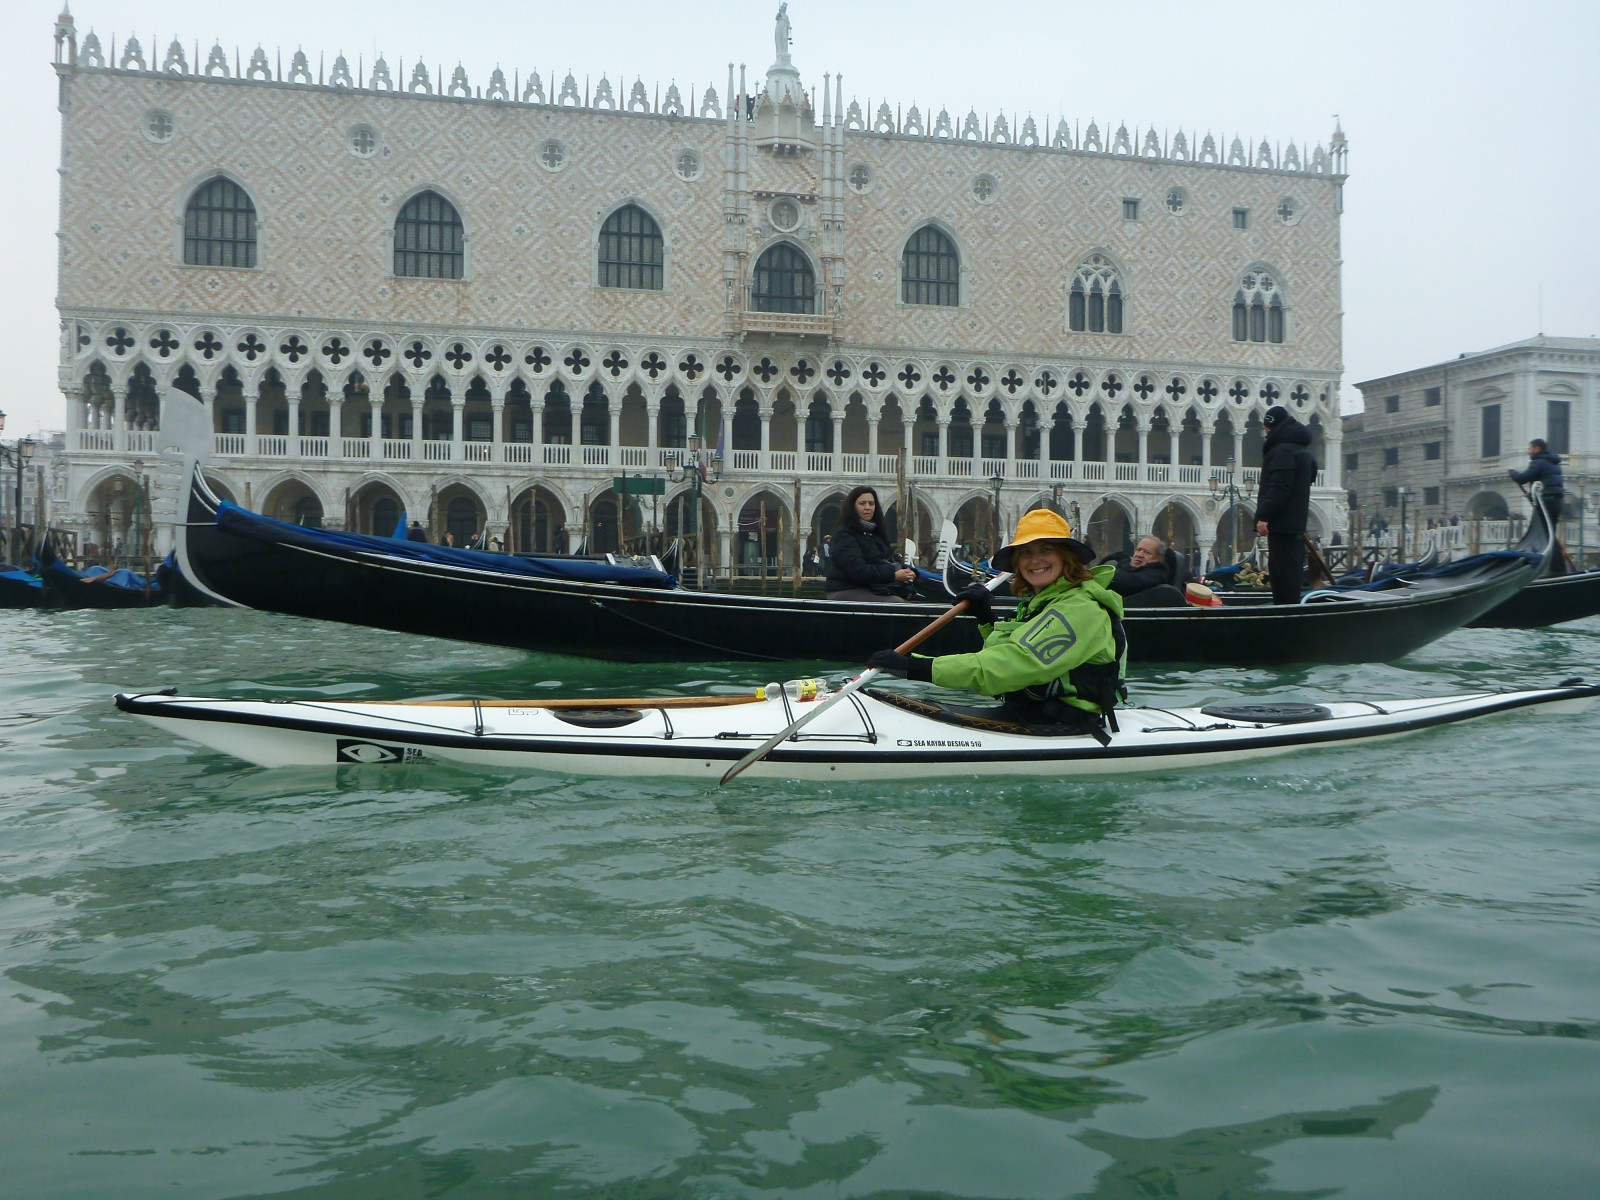 Loretta overtaking a gondola at San Marco